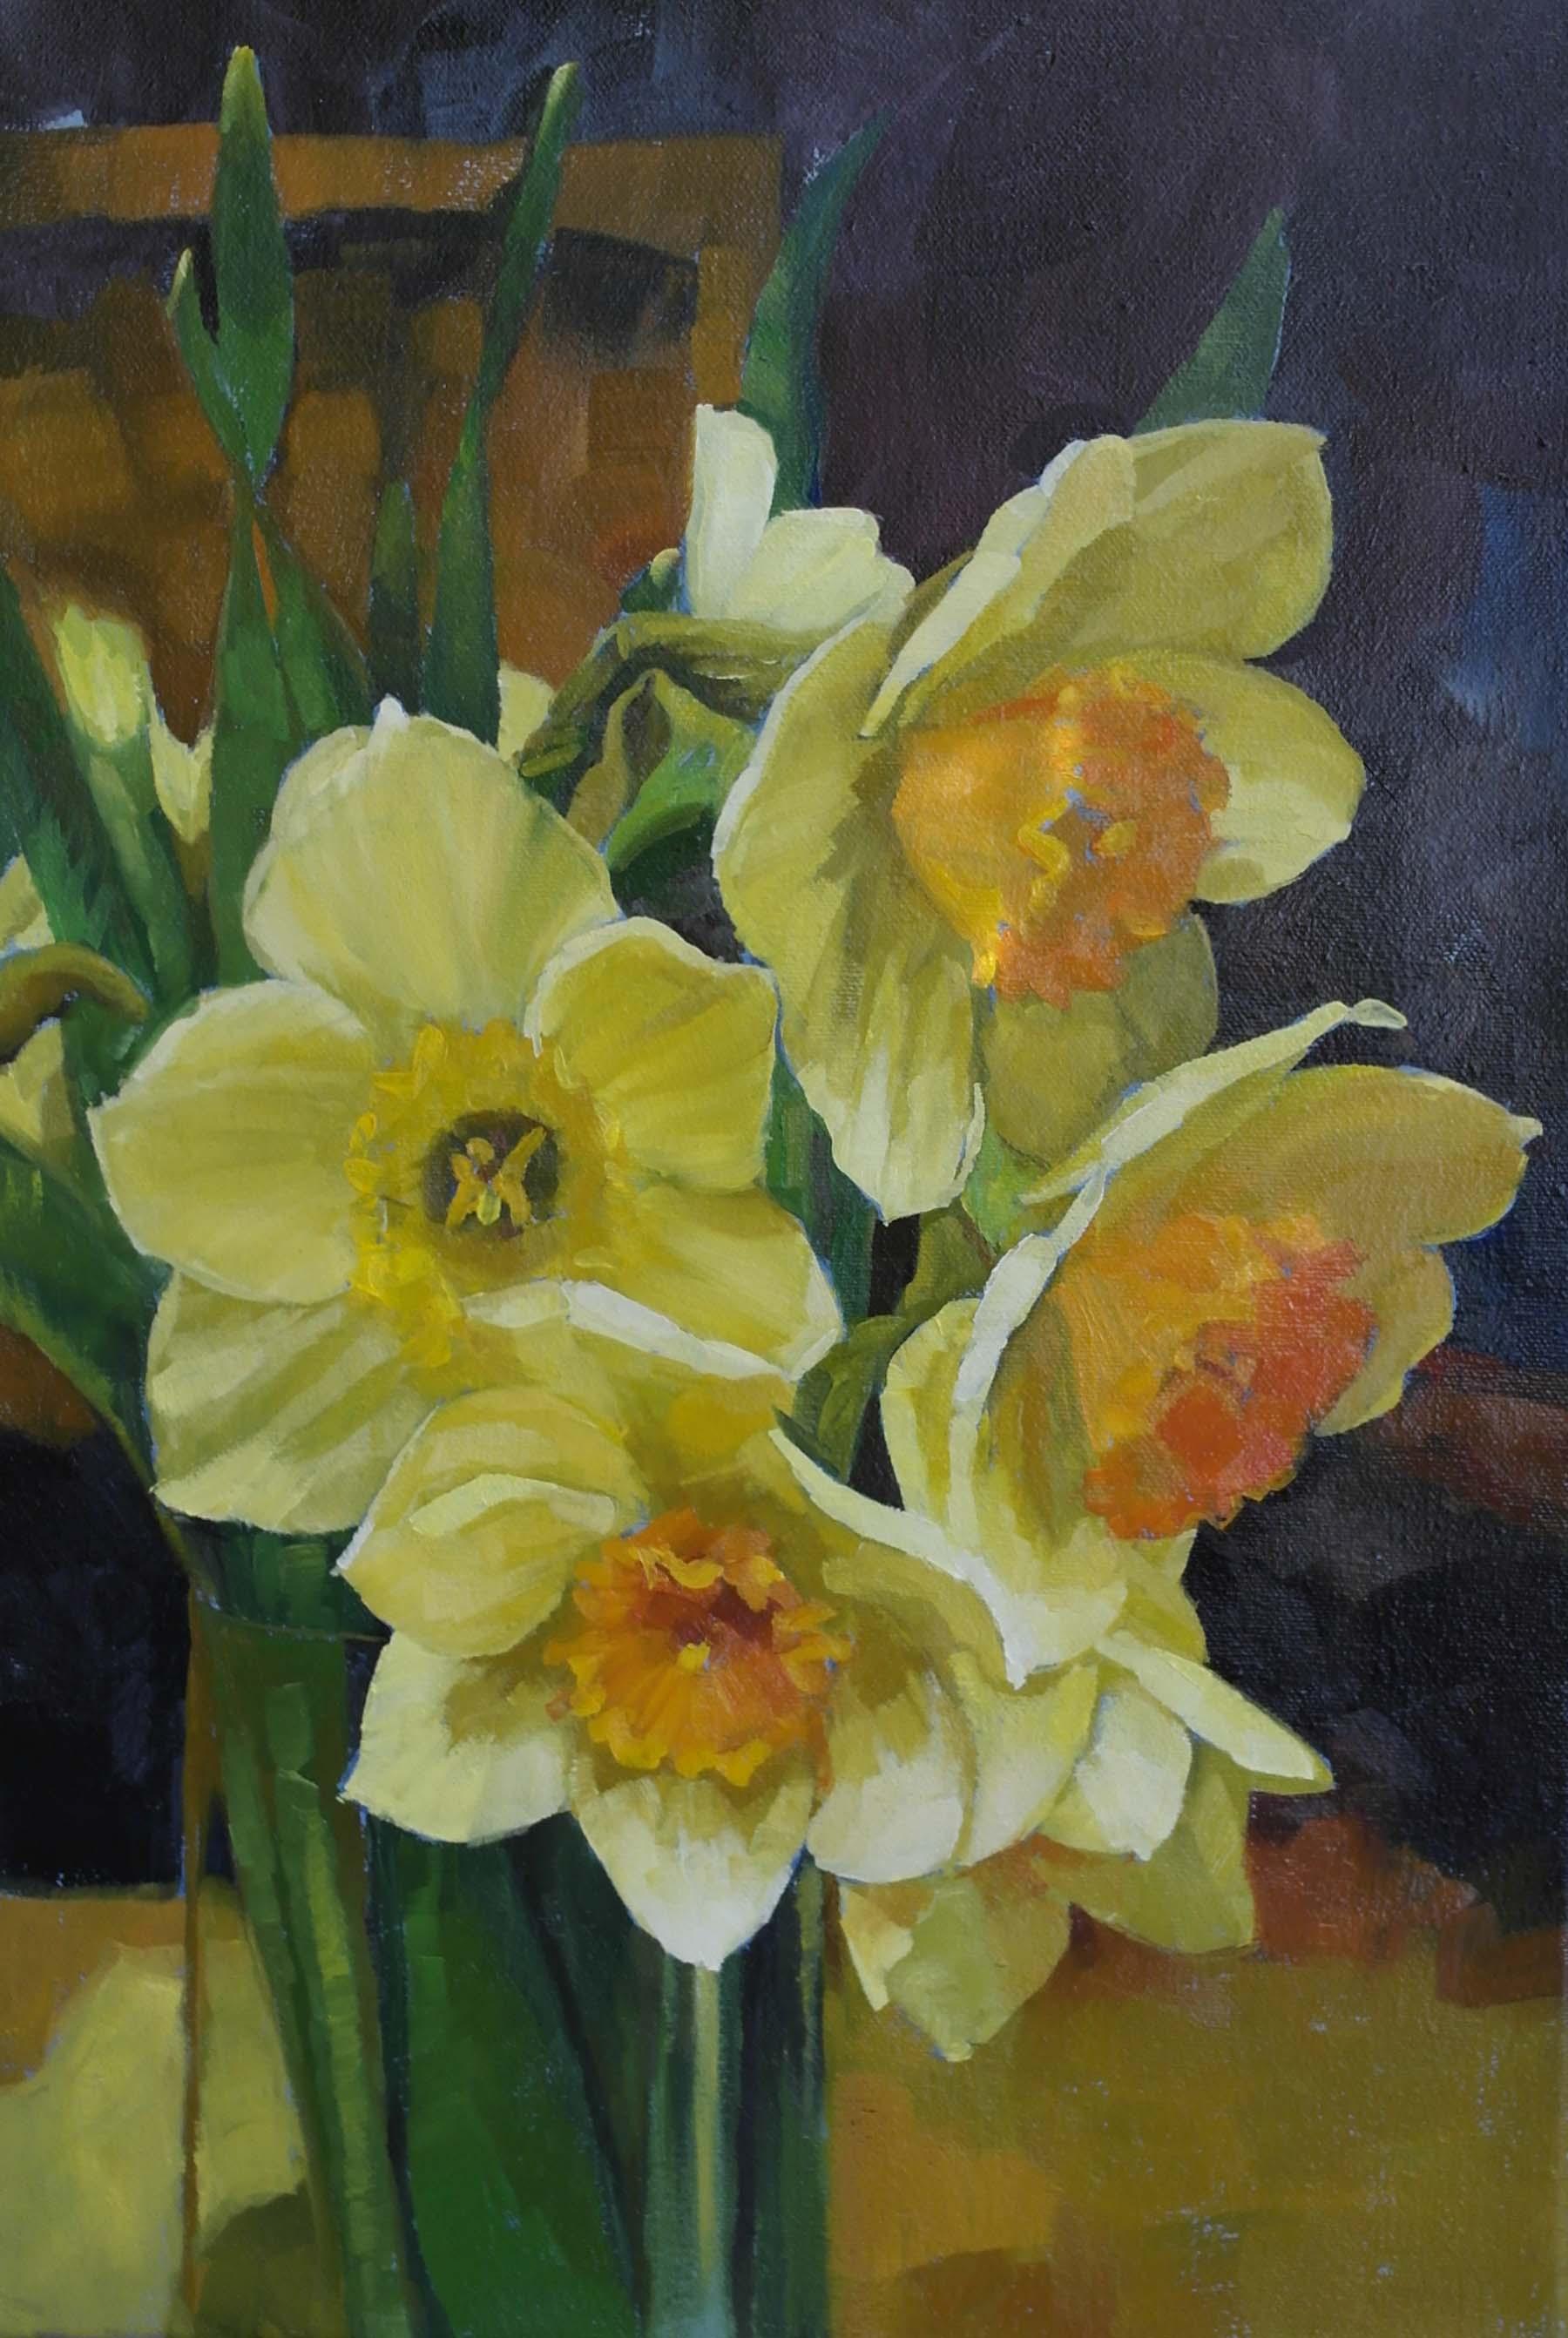 DaffodilBCard.jpg